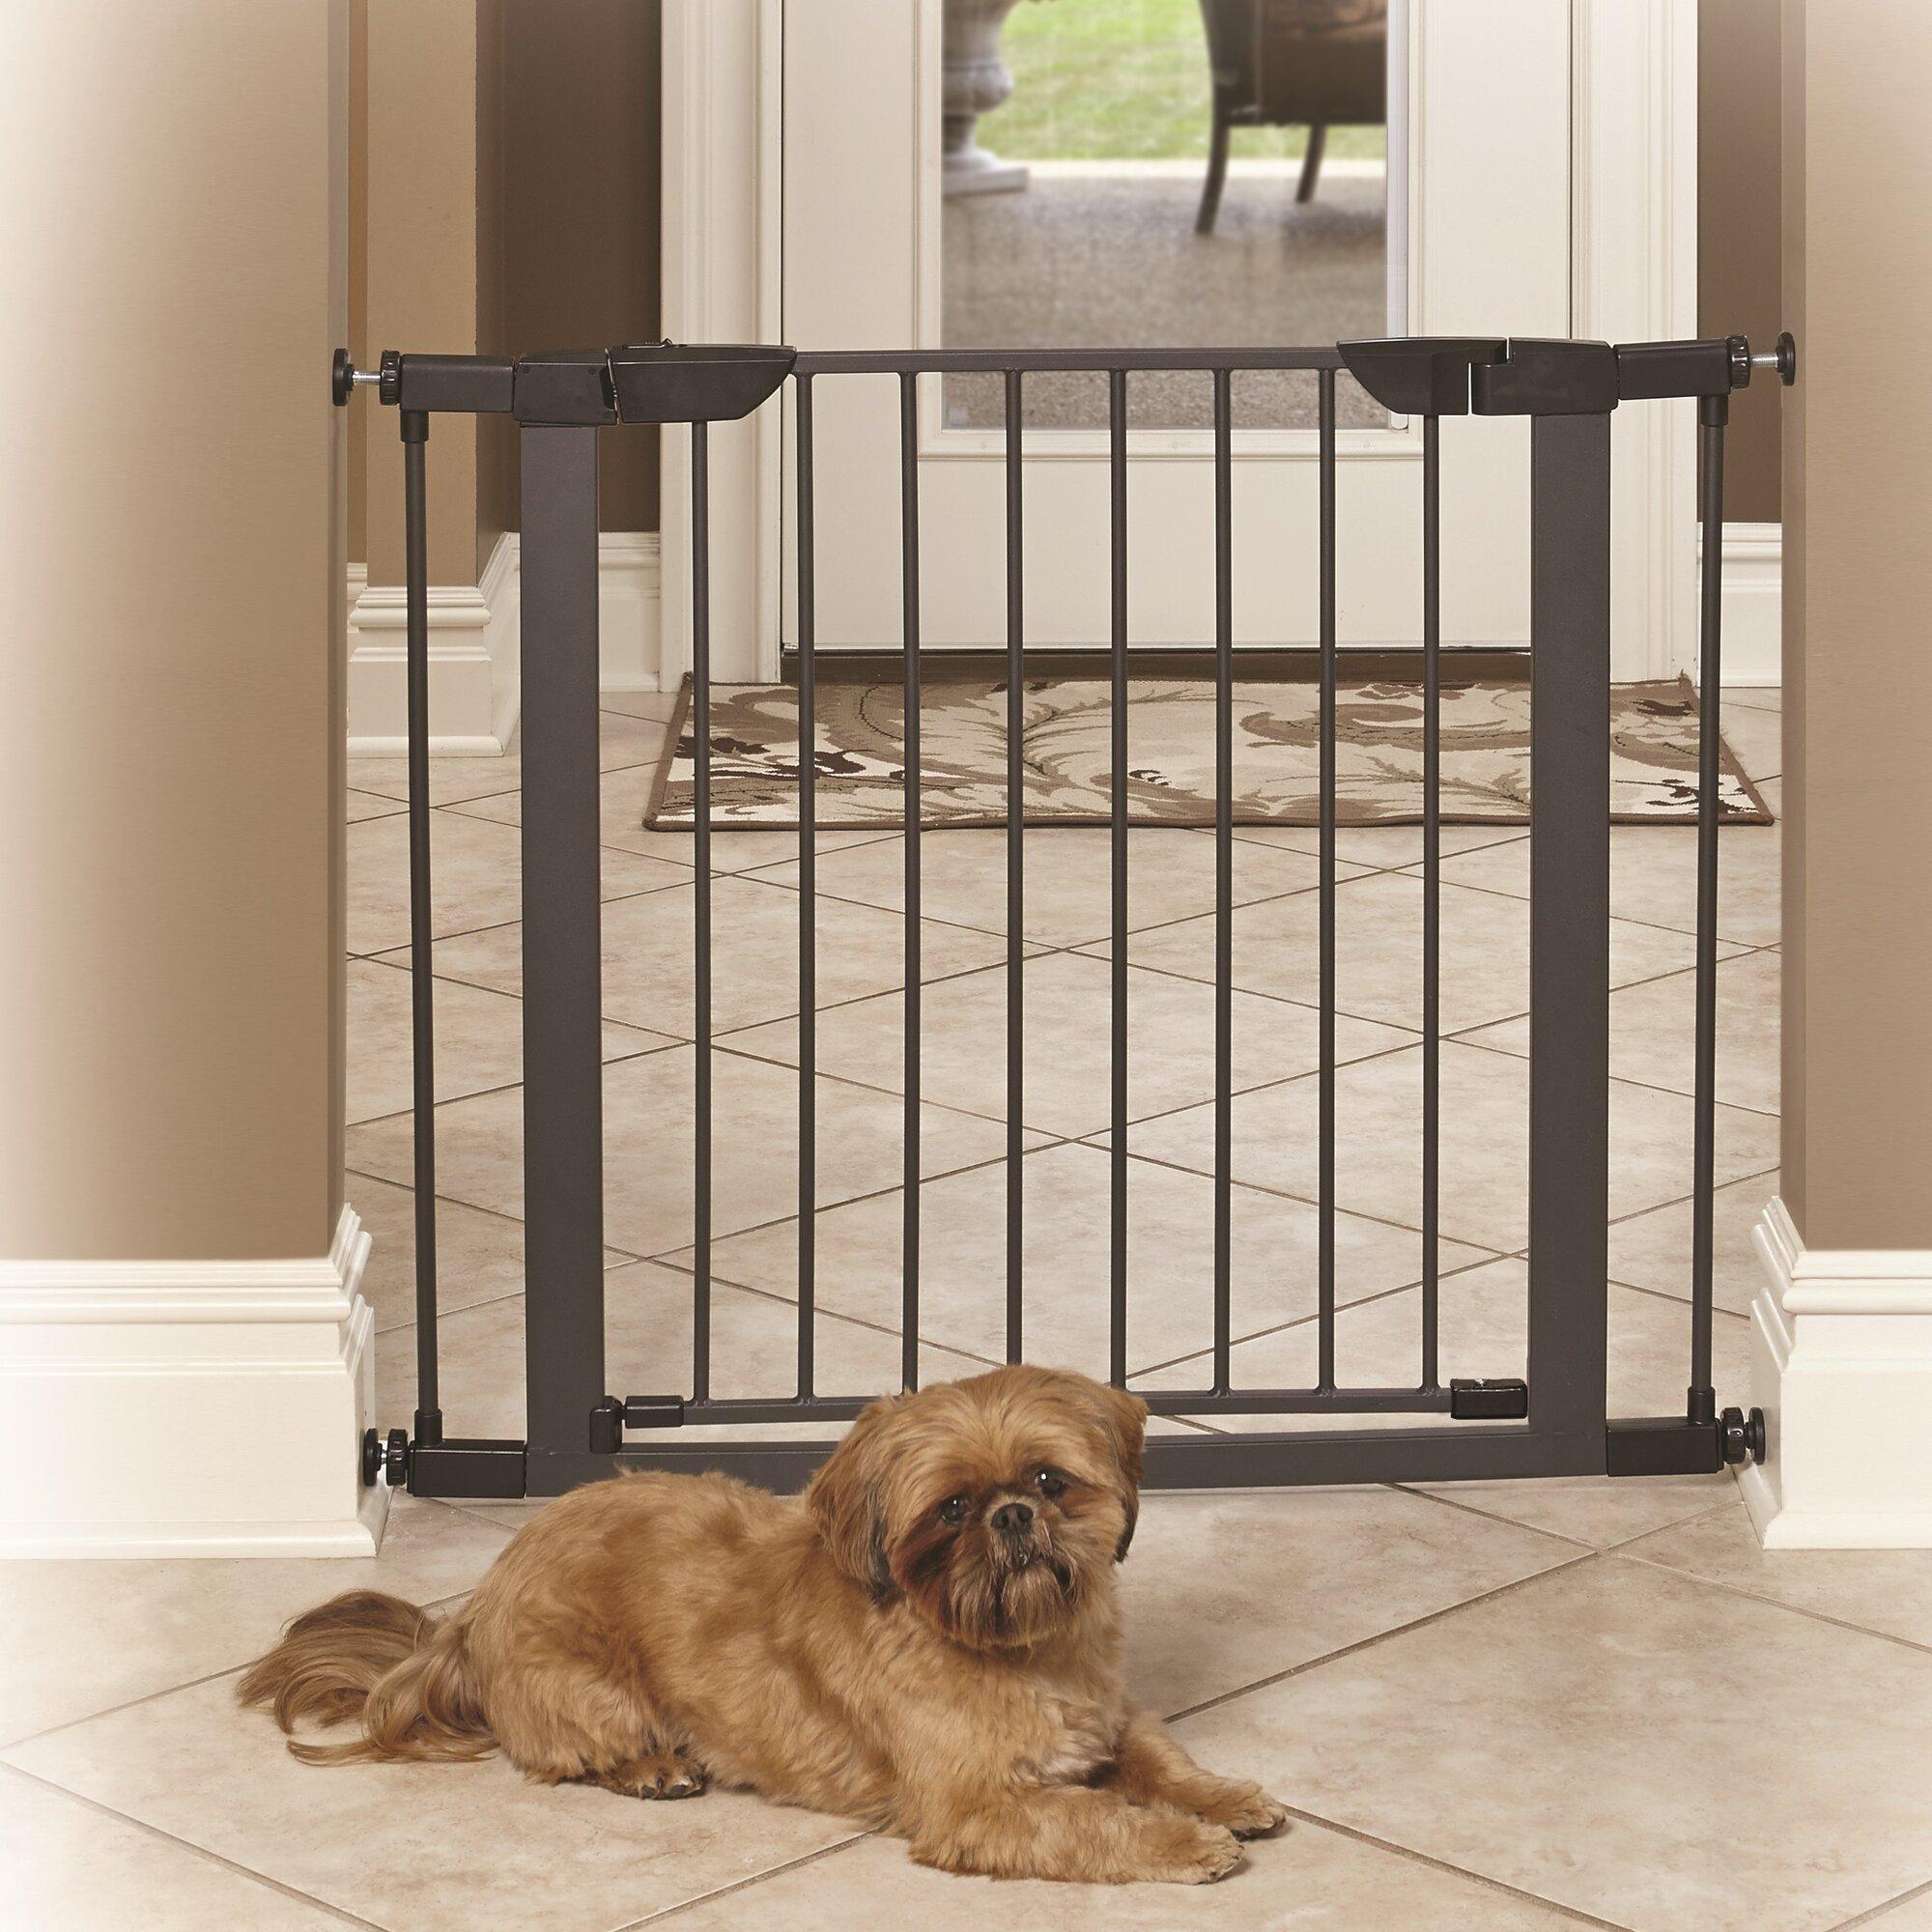 Doggy Gate Dog Gates For Spaces Custom Doggy Gates Regalo